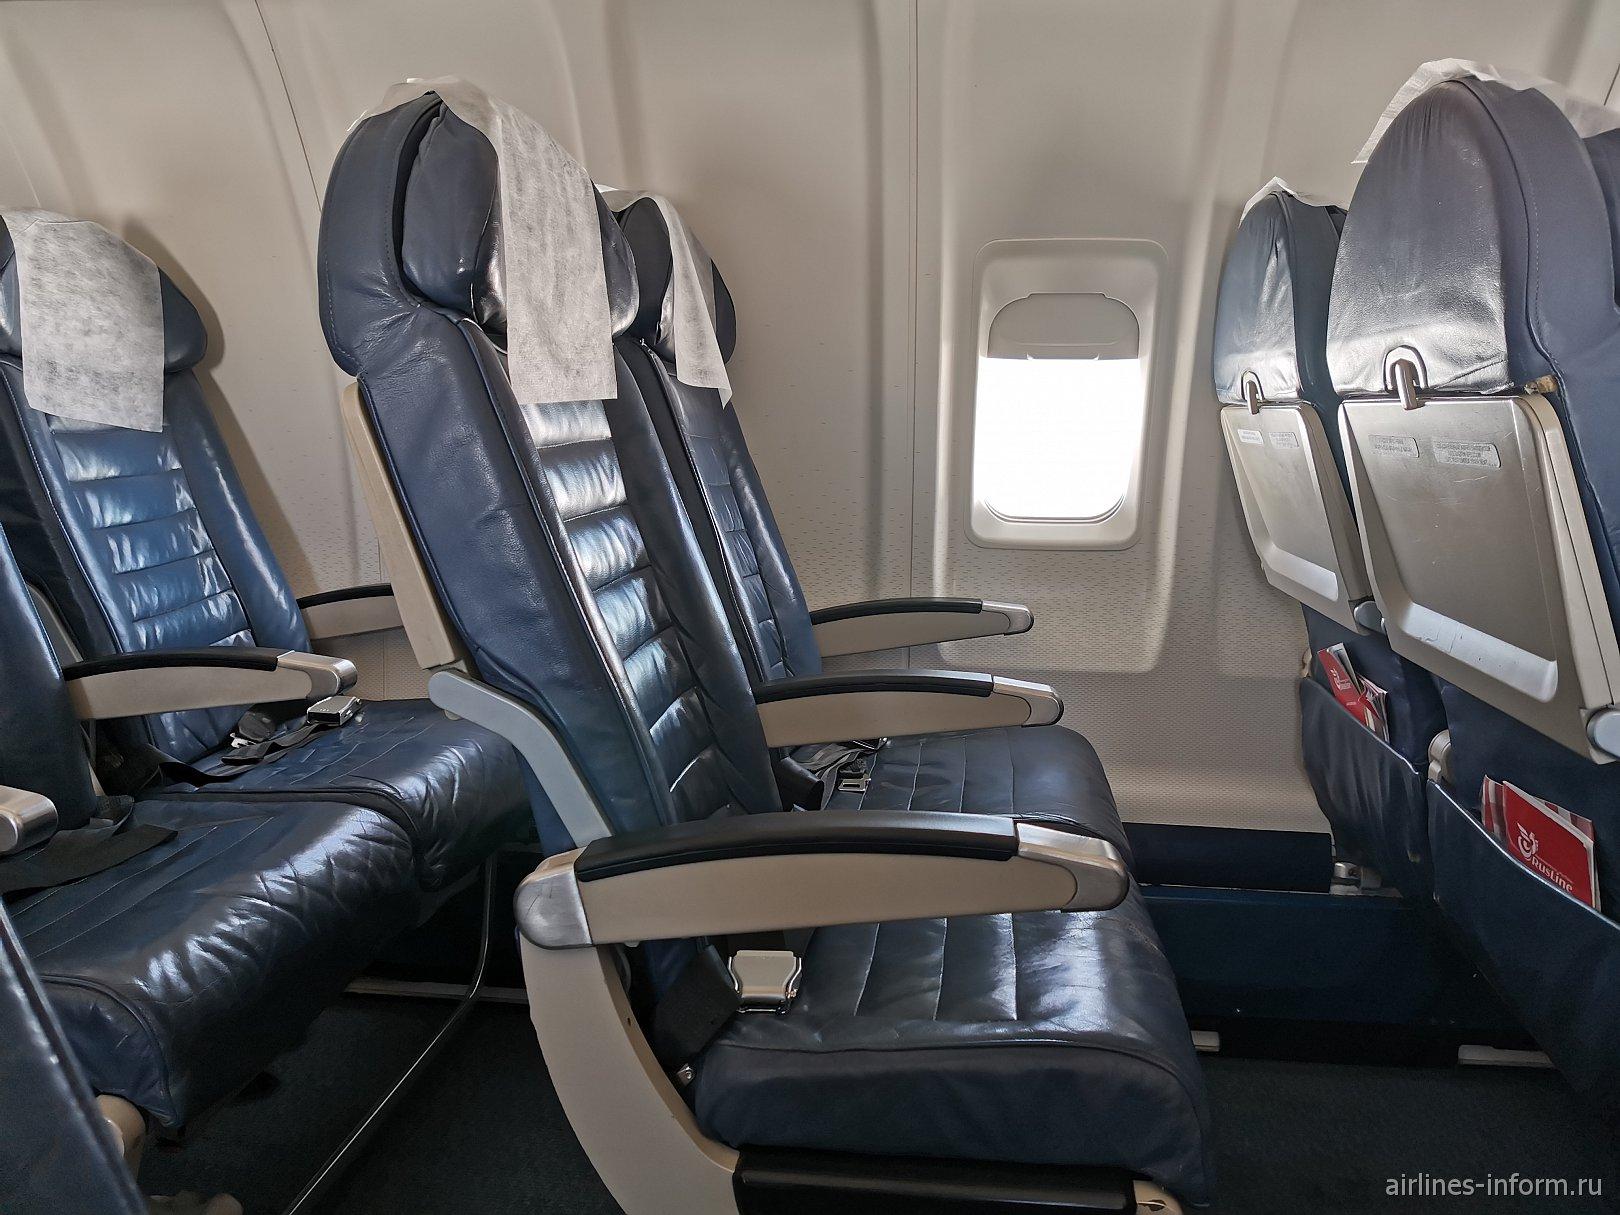 Пассажирские кресла в самолете Bombardier CRJ200 авиакомпании Руслайн